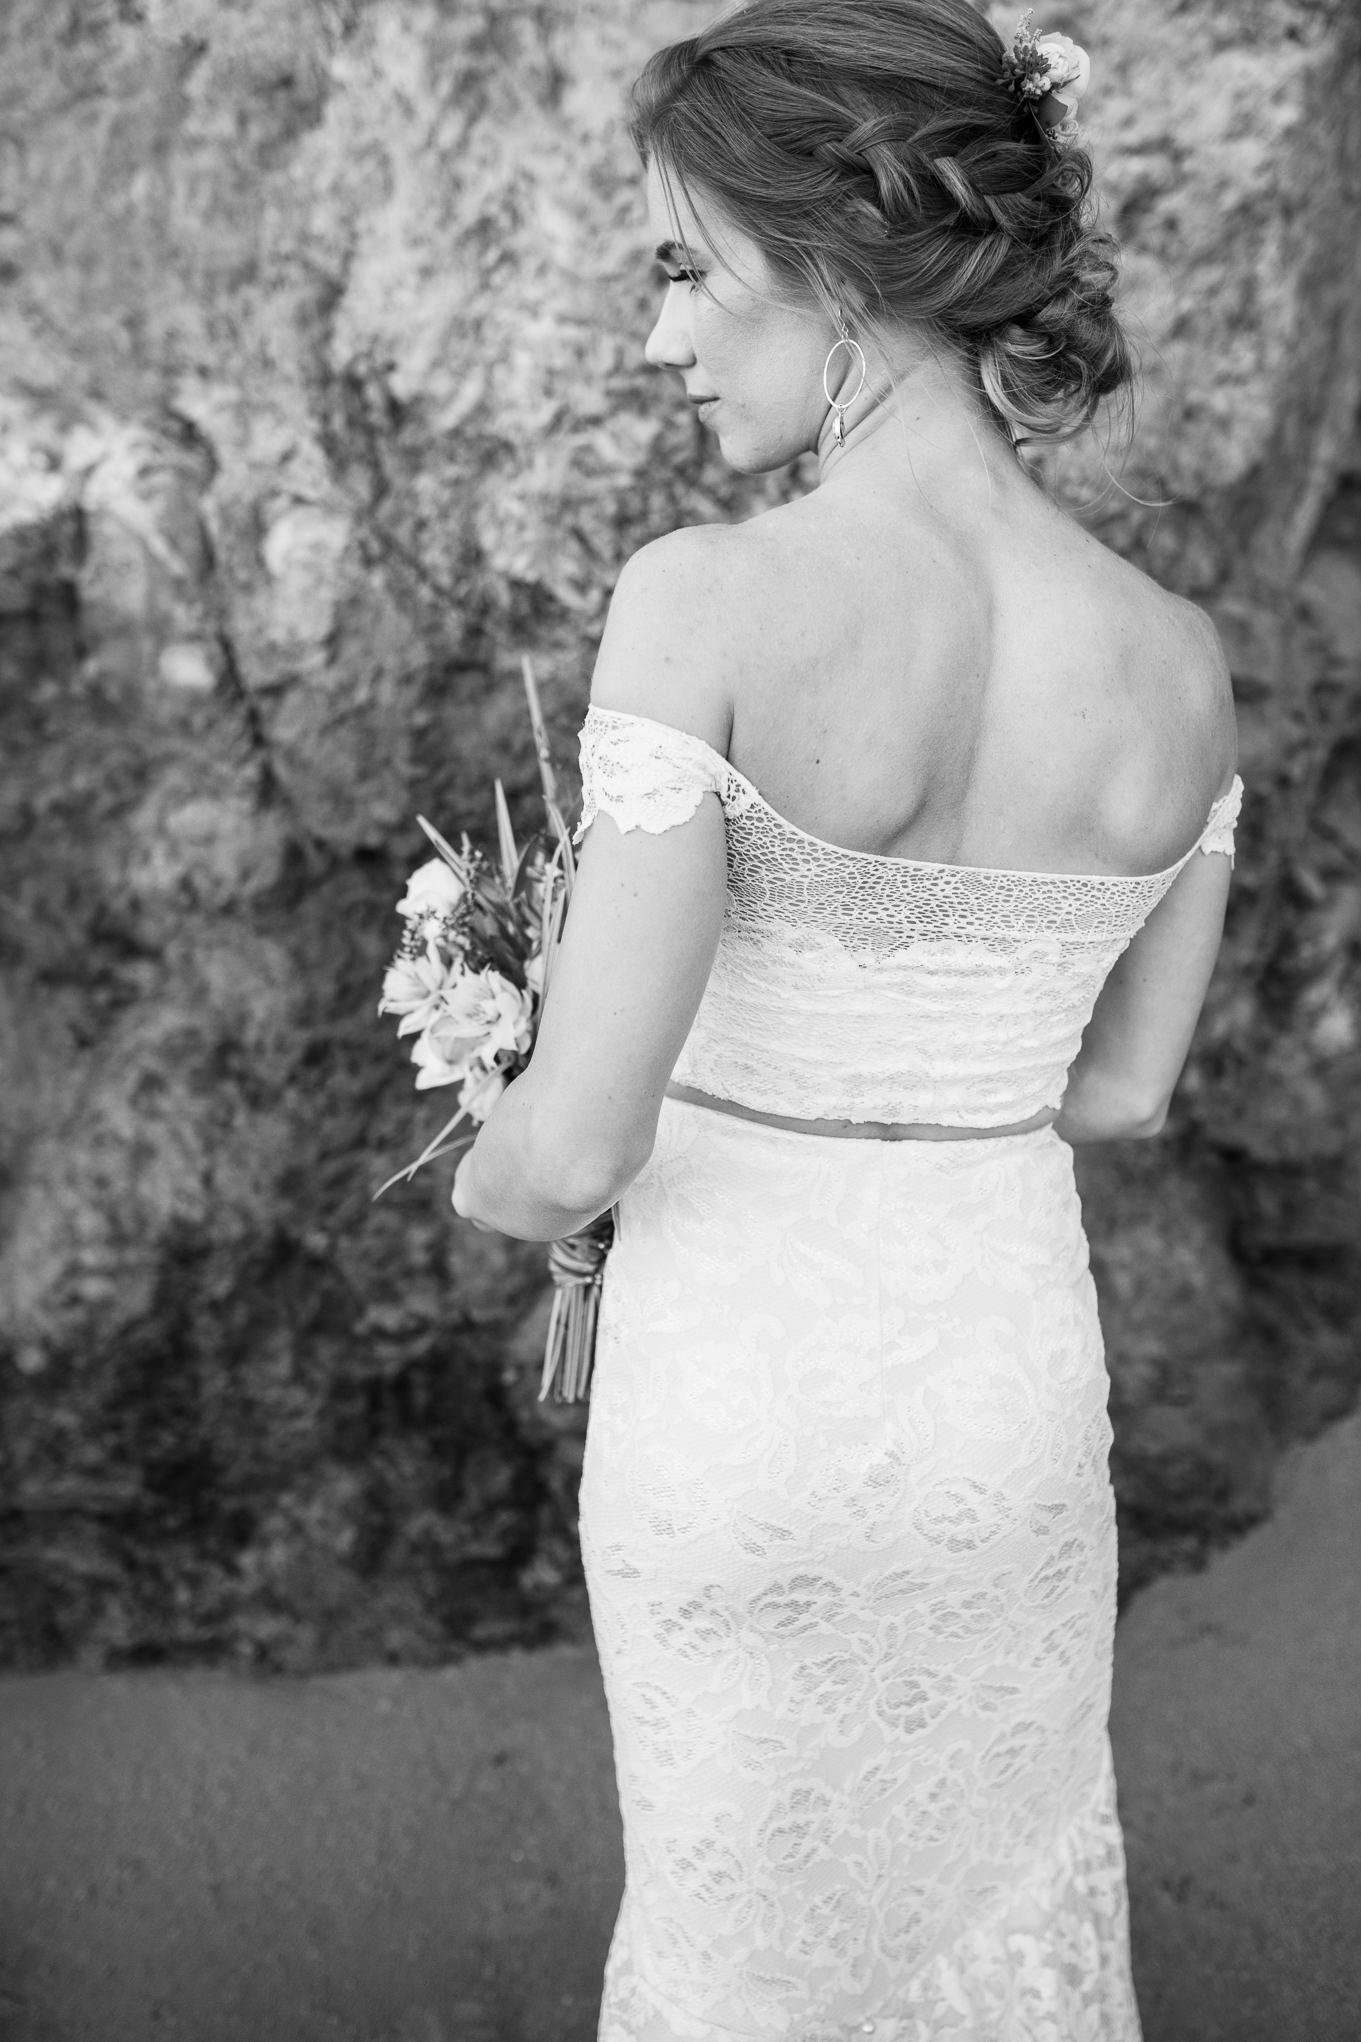 658_ONL_Jenny_Ken_Wedding_Trevor_Hooper_Photo.jpg